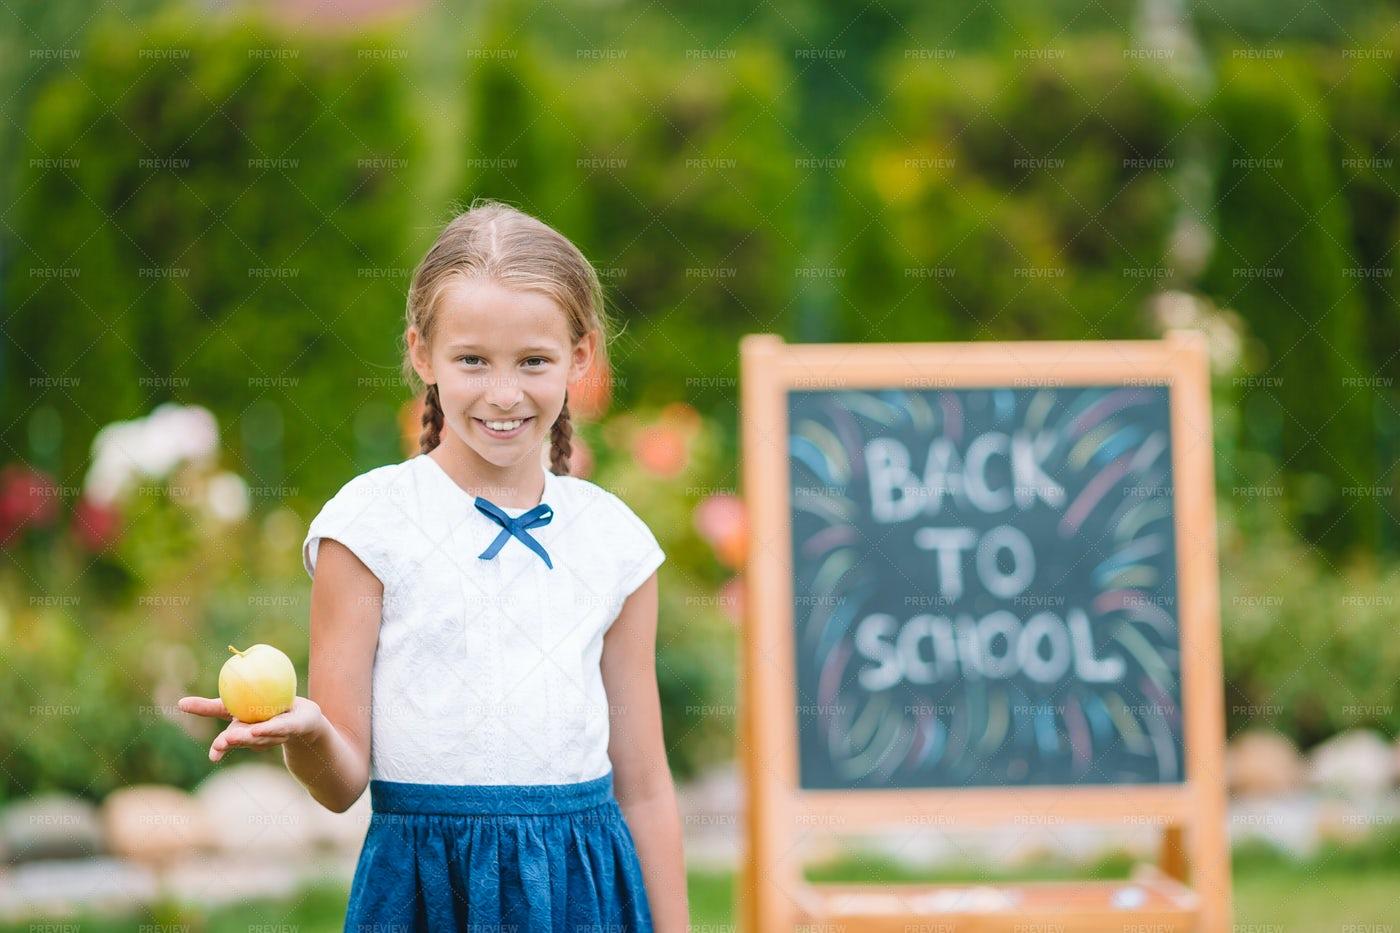 Girl Ready For New School Year: Stock Photos